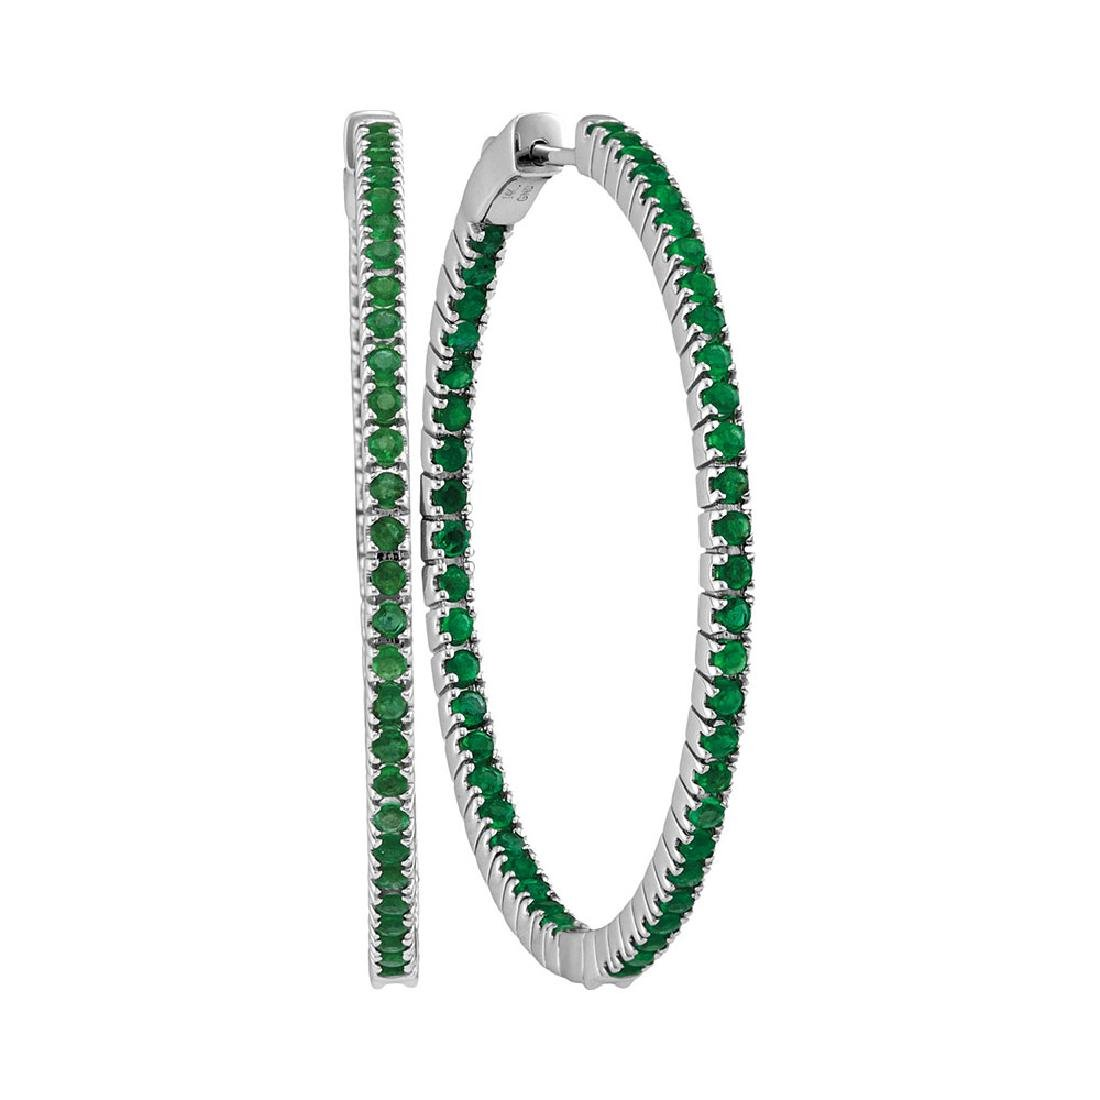 3 CTW Emerald Large Slender In/Out Hoop Earrings 14KT